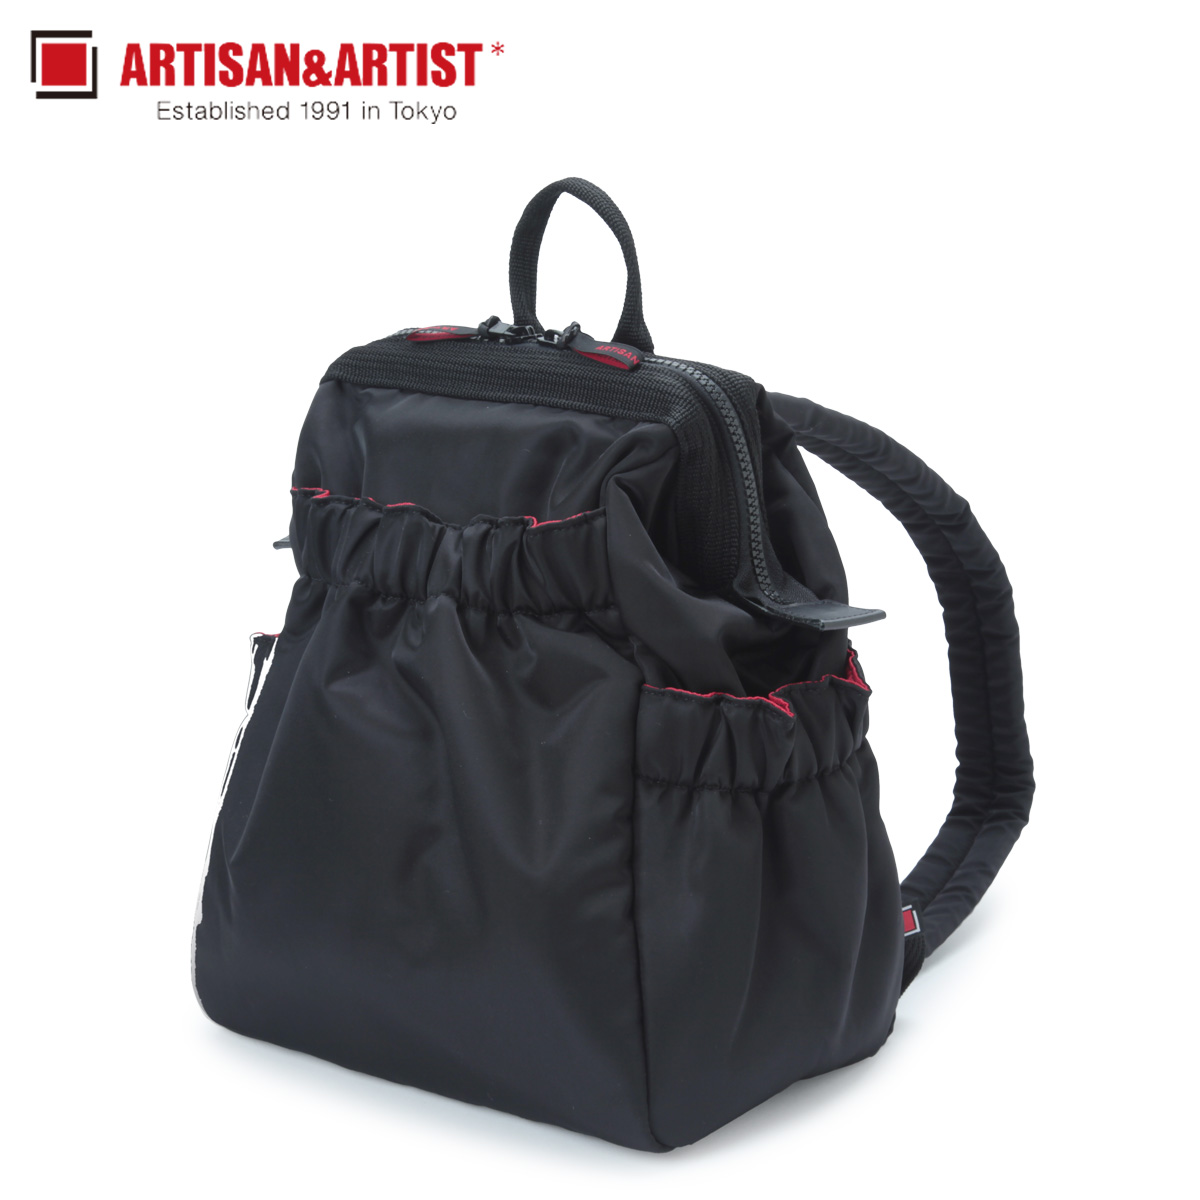 ARTISAN&ARTIST アルティザン&アーティスト リュック バッグ バックパック レディース CLASP STANDARD ブラック 黒 KG2-604